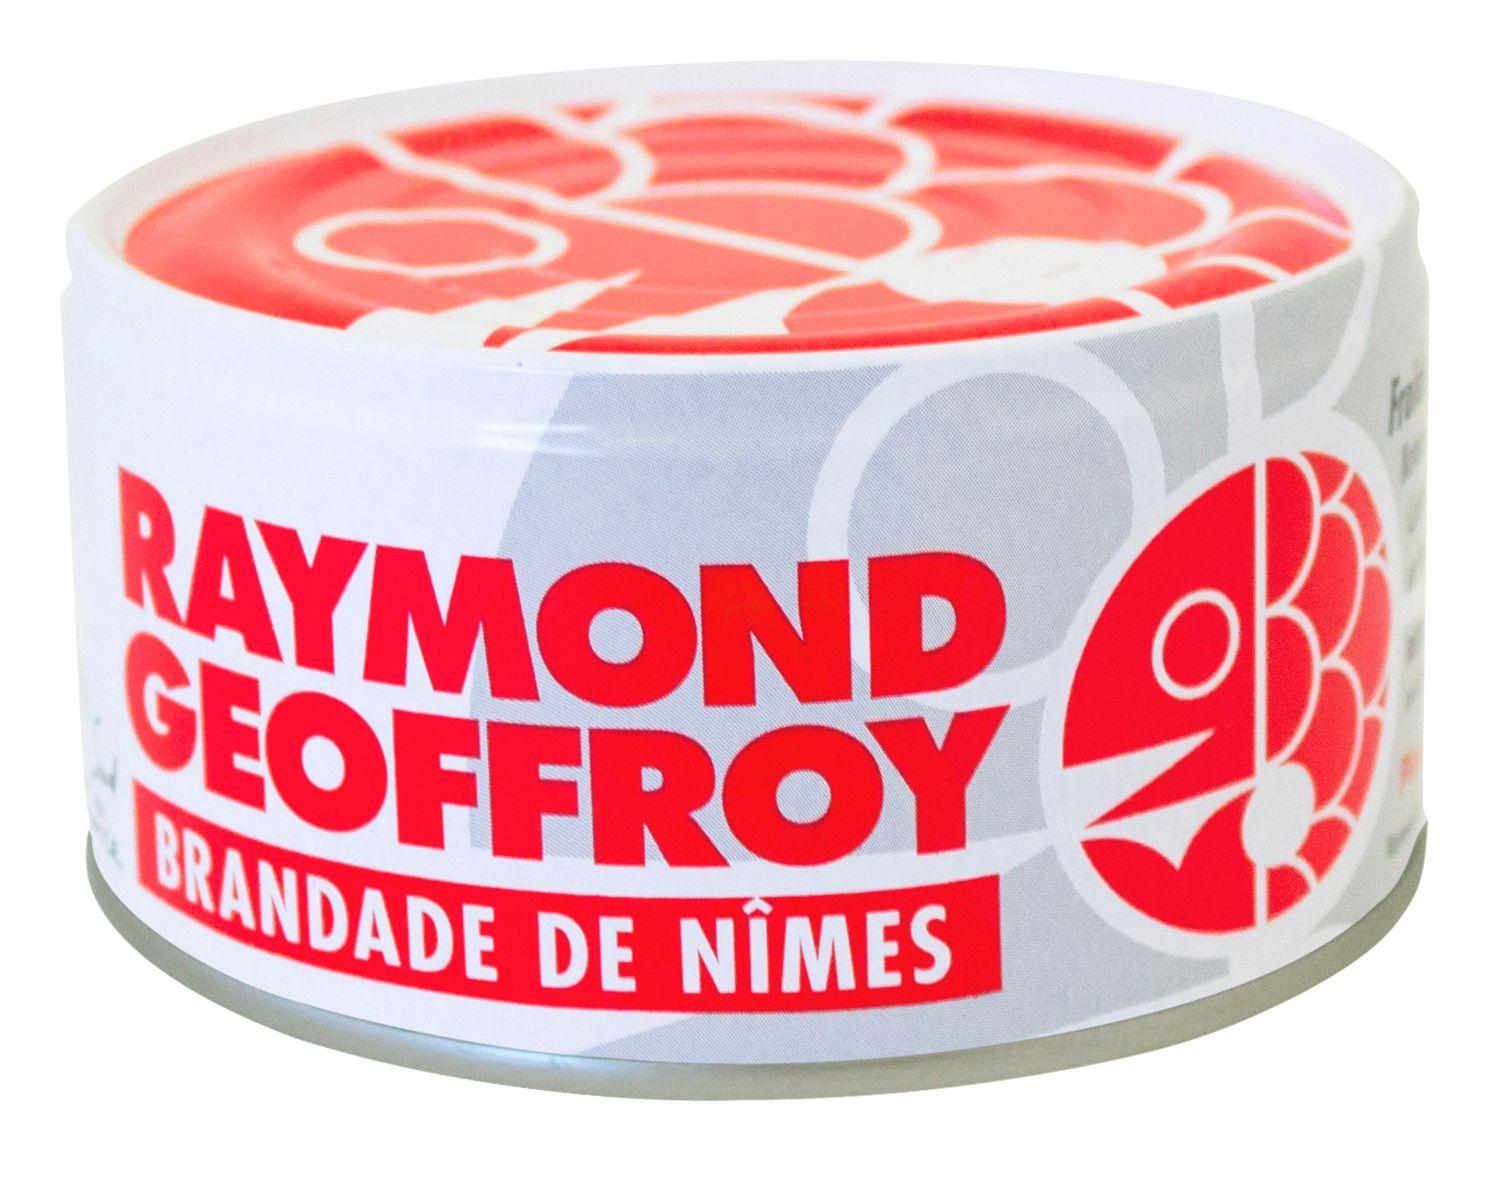 Raymond Geoffroy: Brandade Raymond, Authentique Brandade de Nîmes